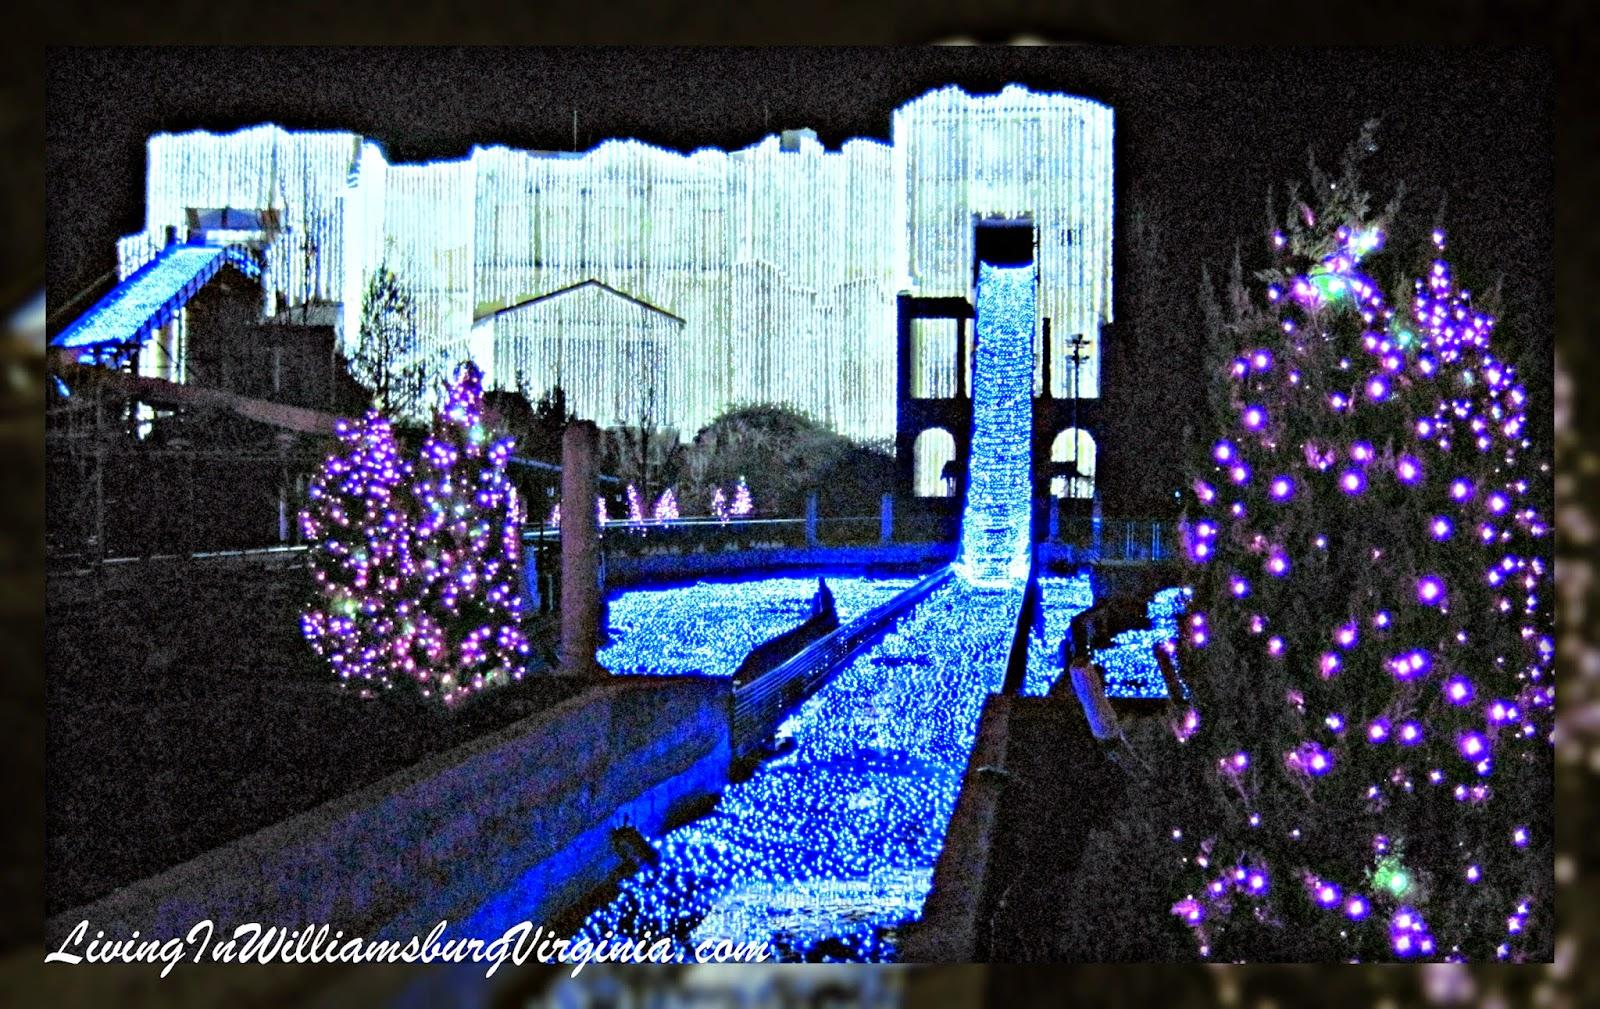 Williamsburg Christmas Town Busch Gardens.Living In Williamsburg Virginia Christmas Town Busch